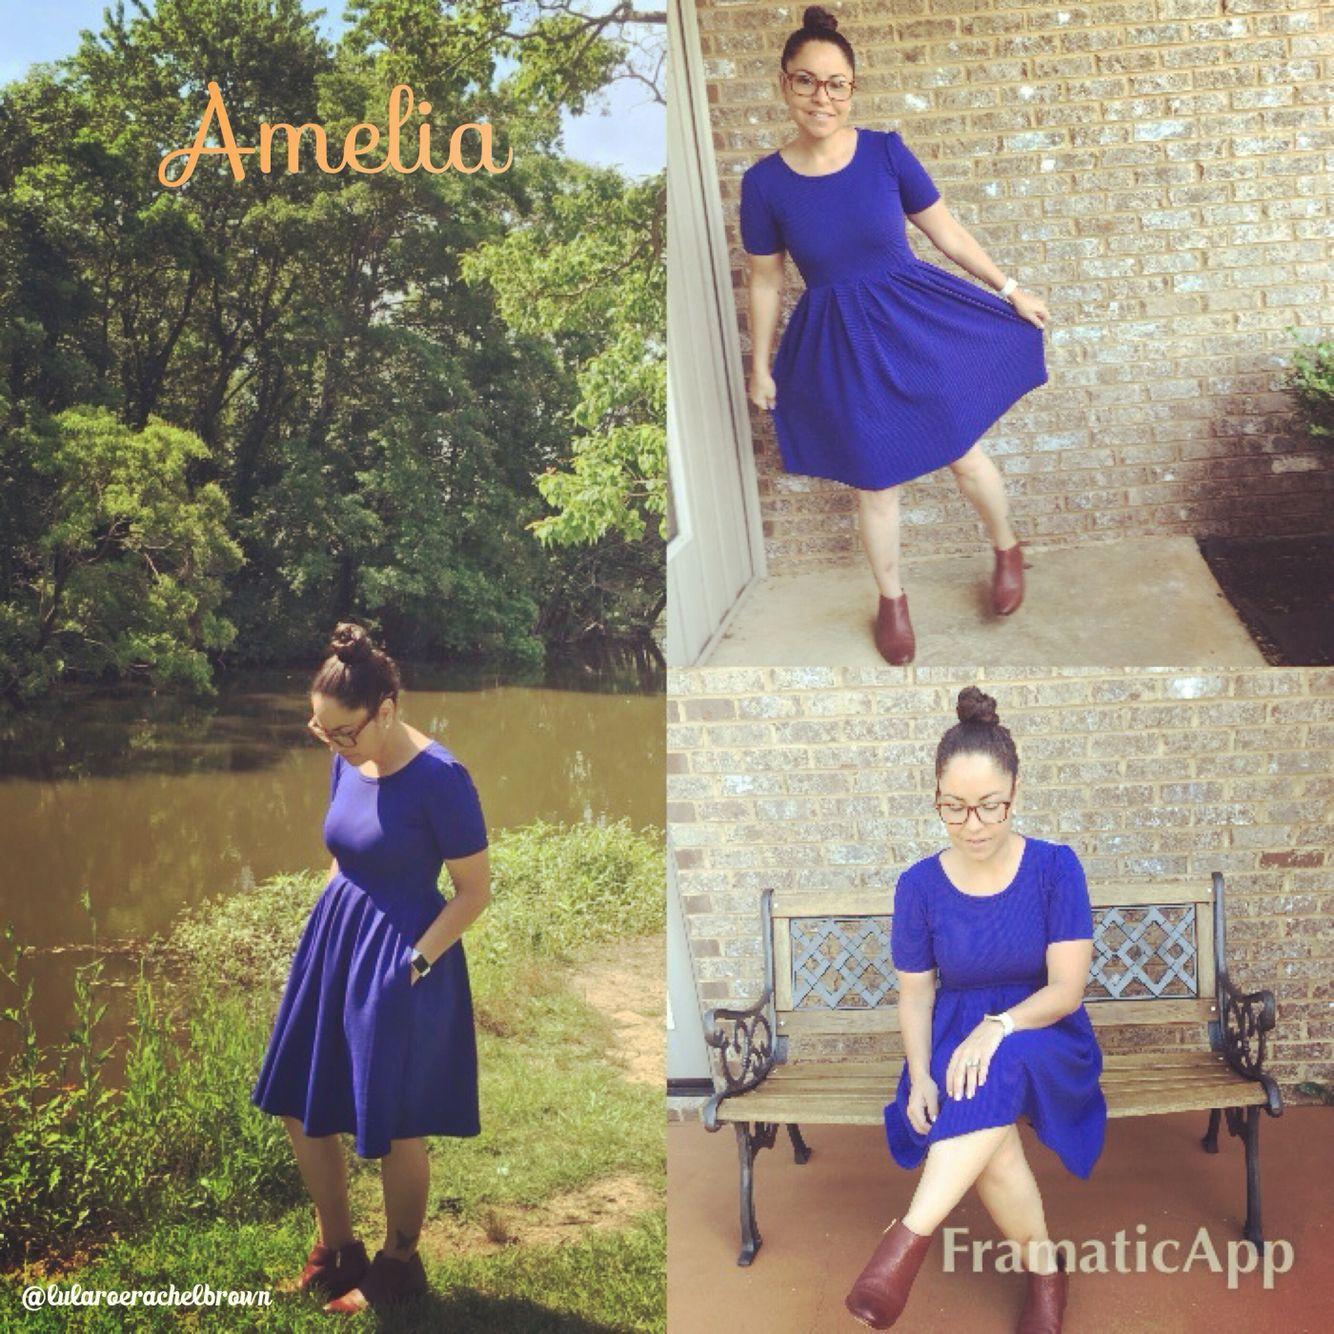 LuLaRoe Amelia Dress in blue  so Classic with Sam Edelman booties.